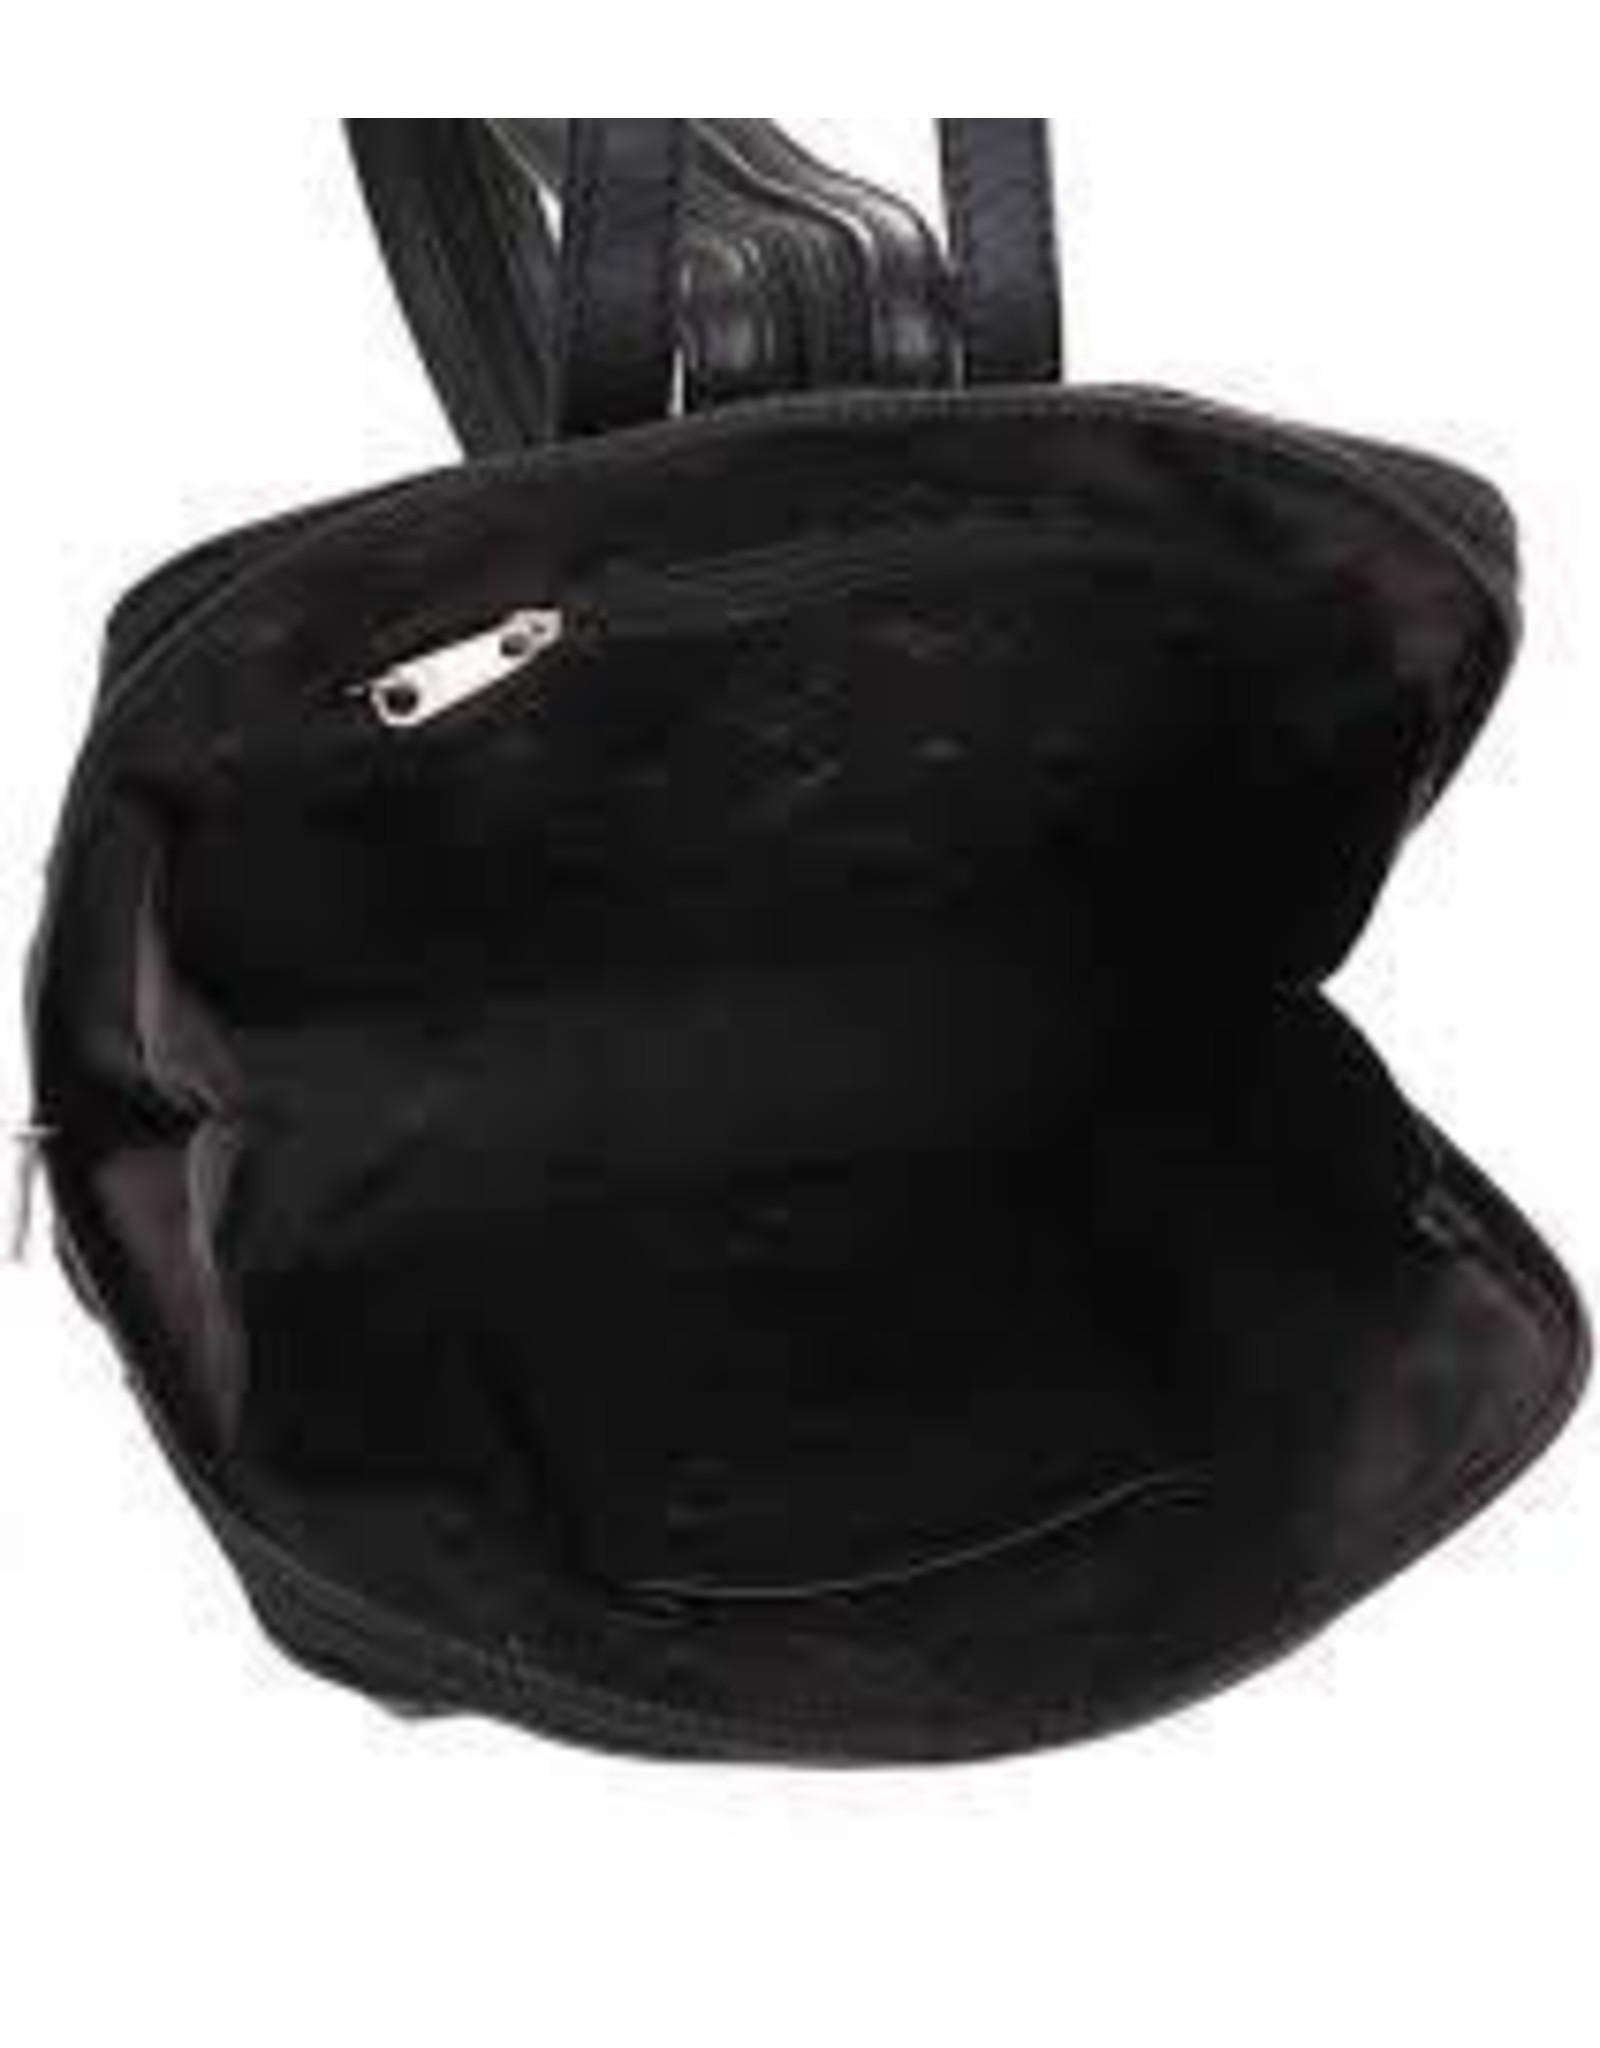 Bear Design Leather backpacks - Bear Design Leather Backpack Black B6265